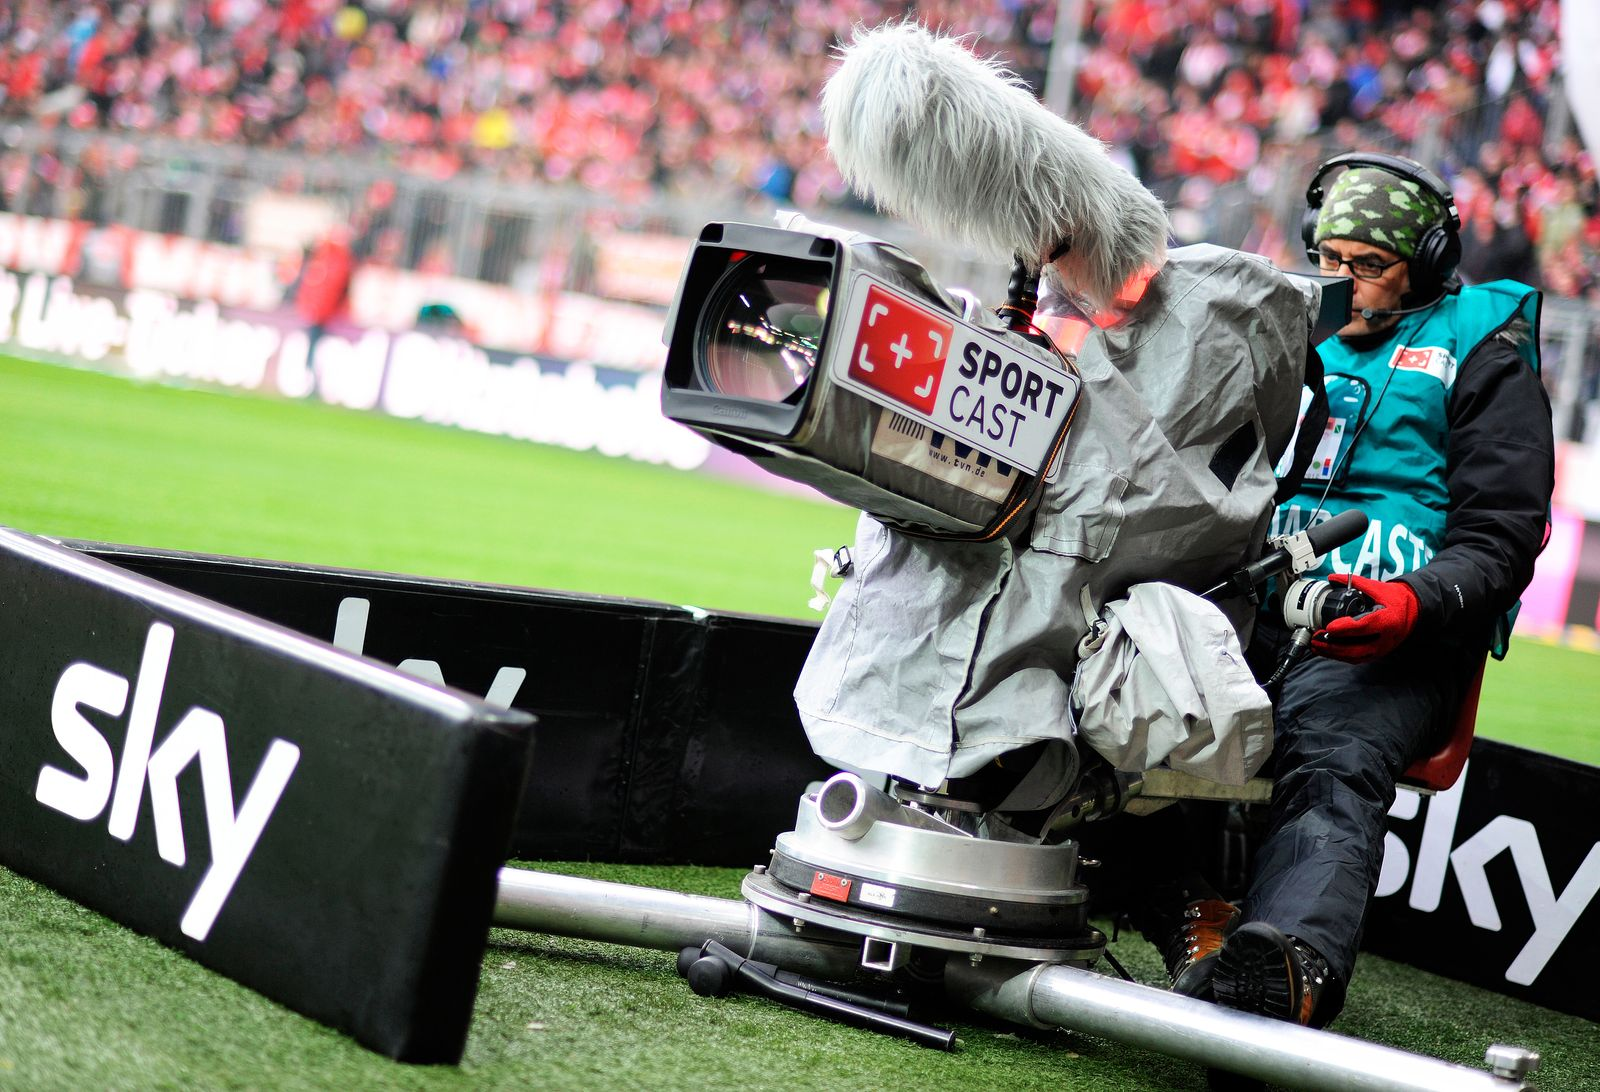 SKY / TV-Bundesligarechte